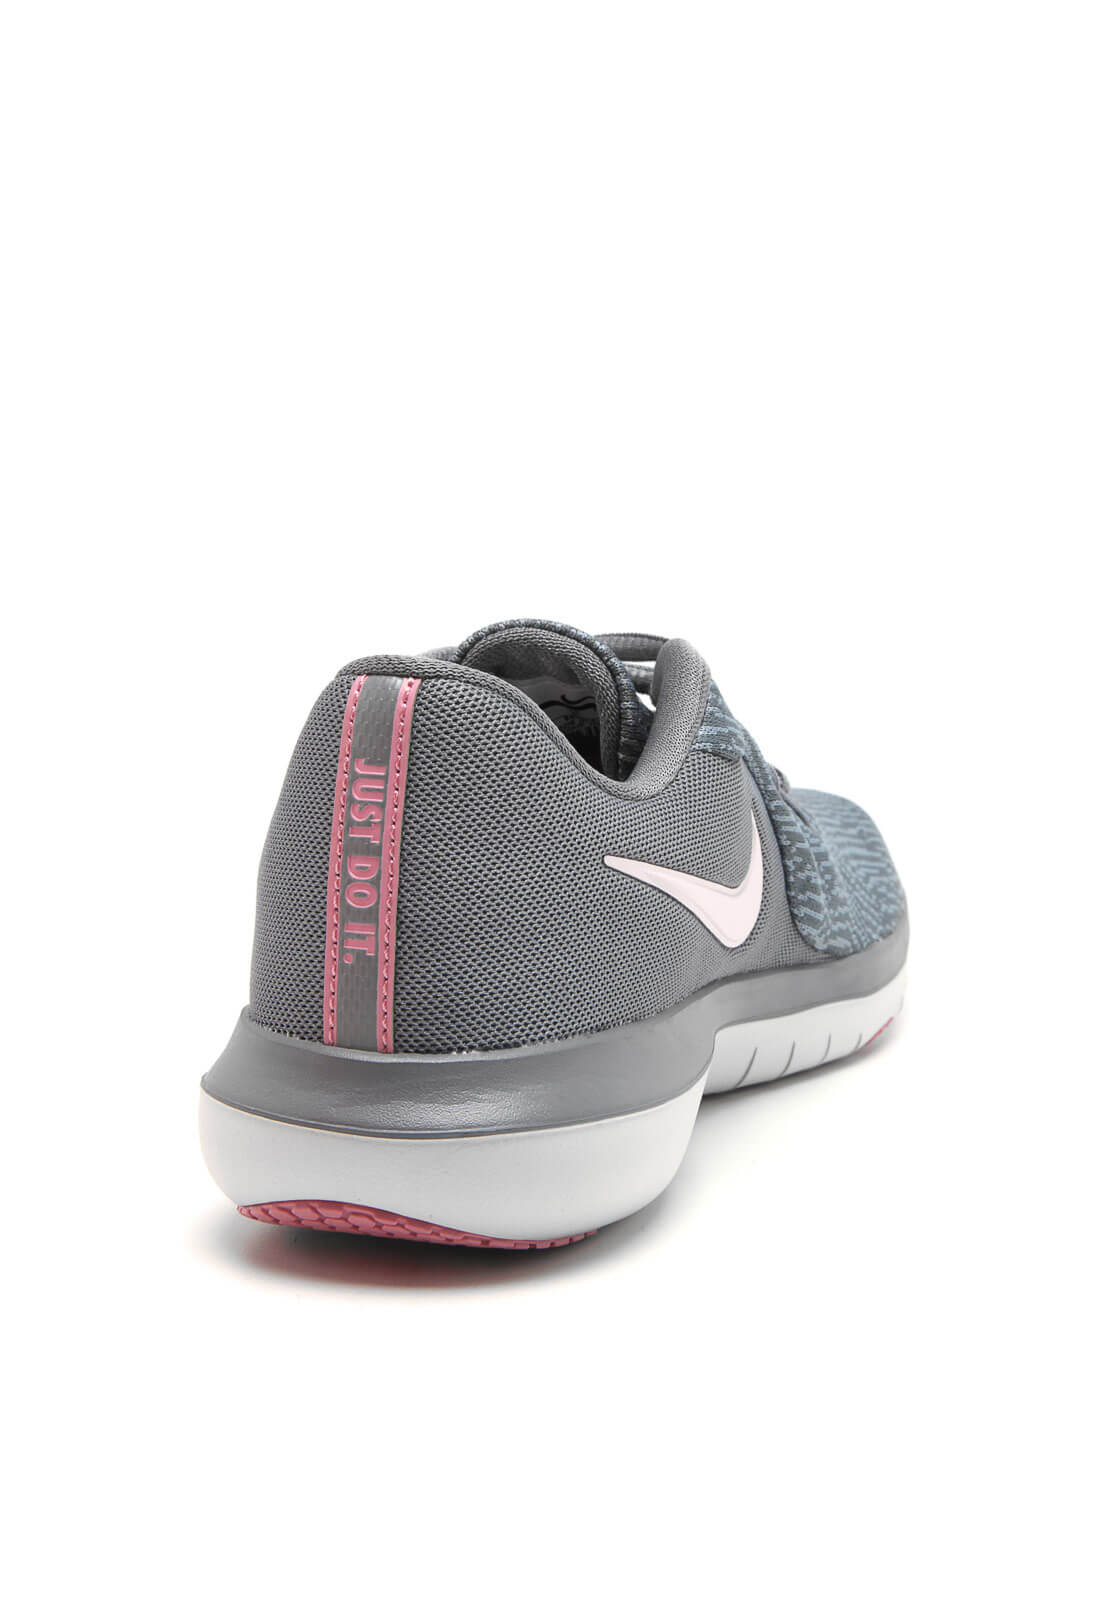 8f6538a159c Tênis Feminino Nike Flex Supreme Tr 6 - BRACIA SHOP  Loja de Roupas ...